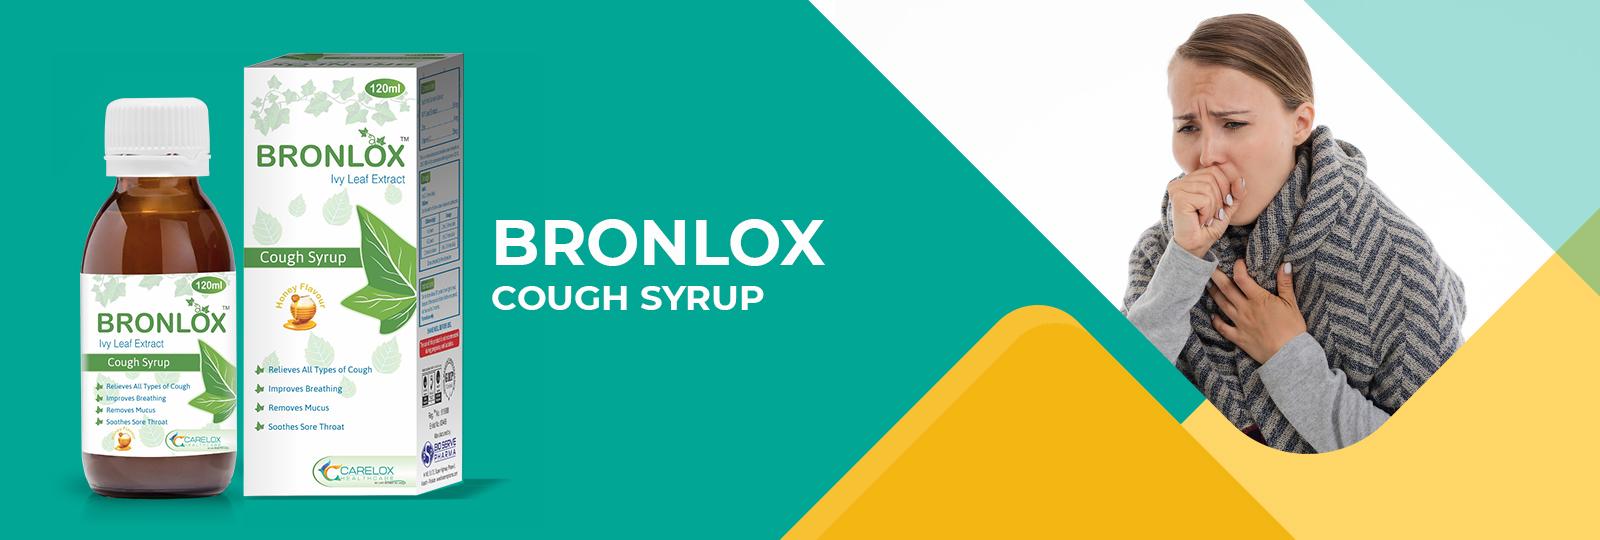 bronlox-banner